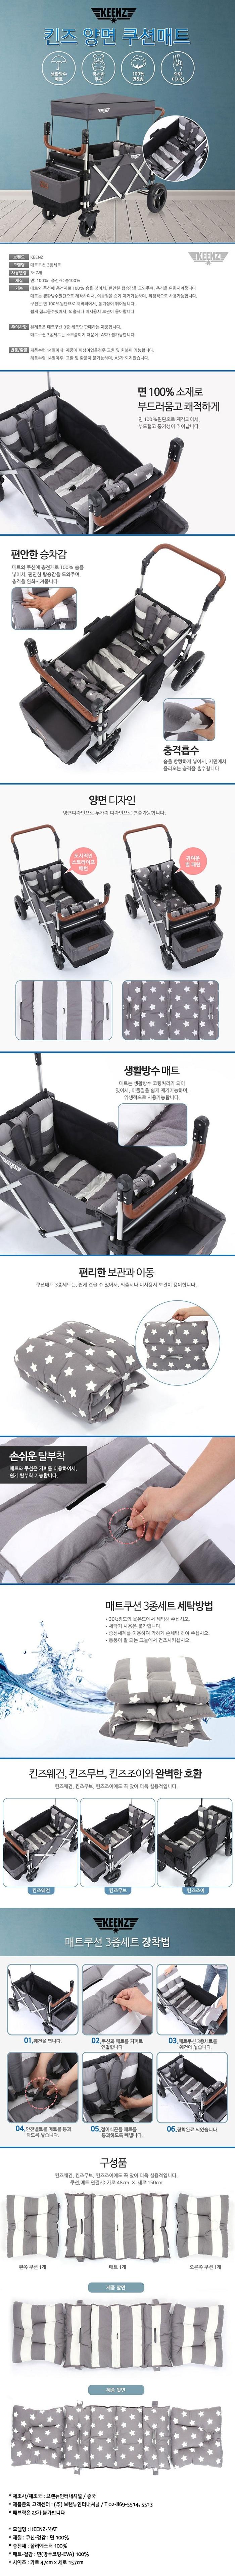 Gray Wagon Moov Cushion Two-sided Mat Joy 100/% Cotton Waterproof Keenz